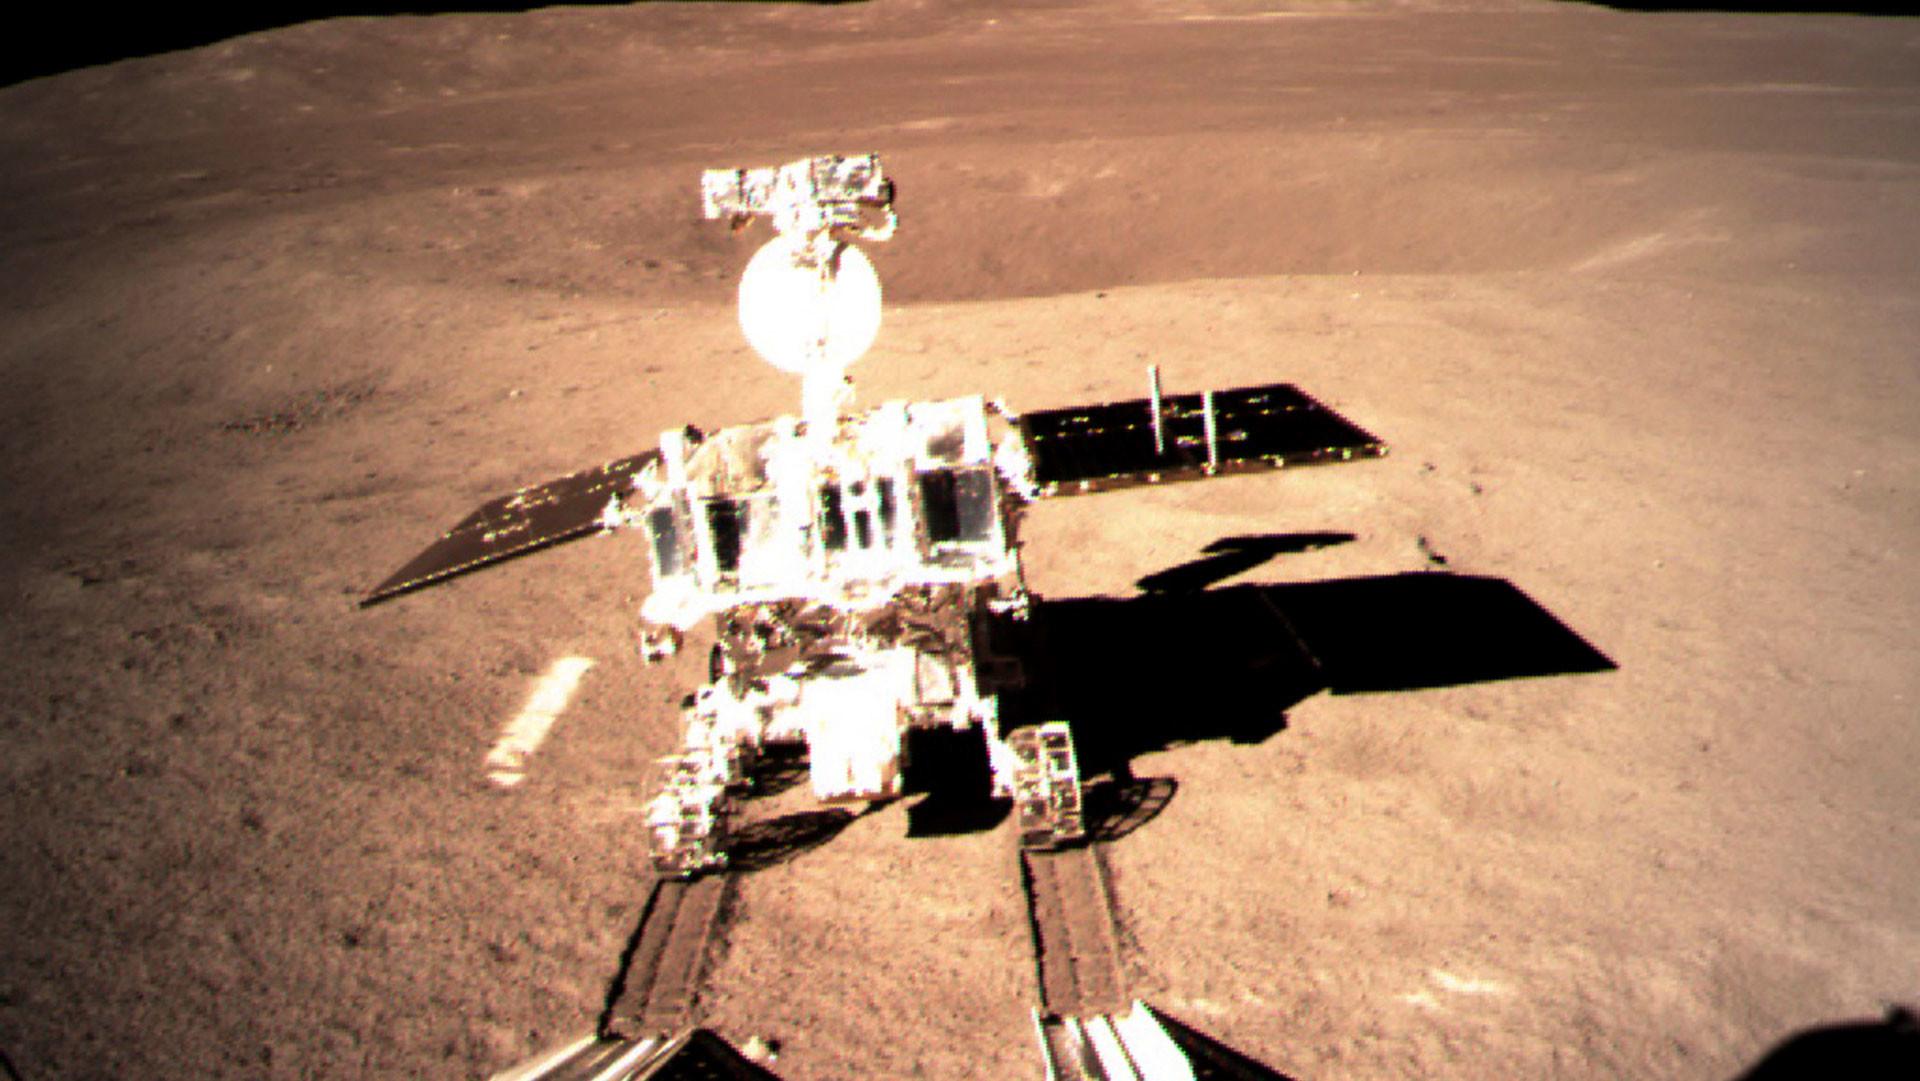 Китайский лунный марсоход Yutu-2. Фото: © China National Space Administration/Xinhua News Agency via AP